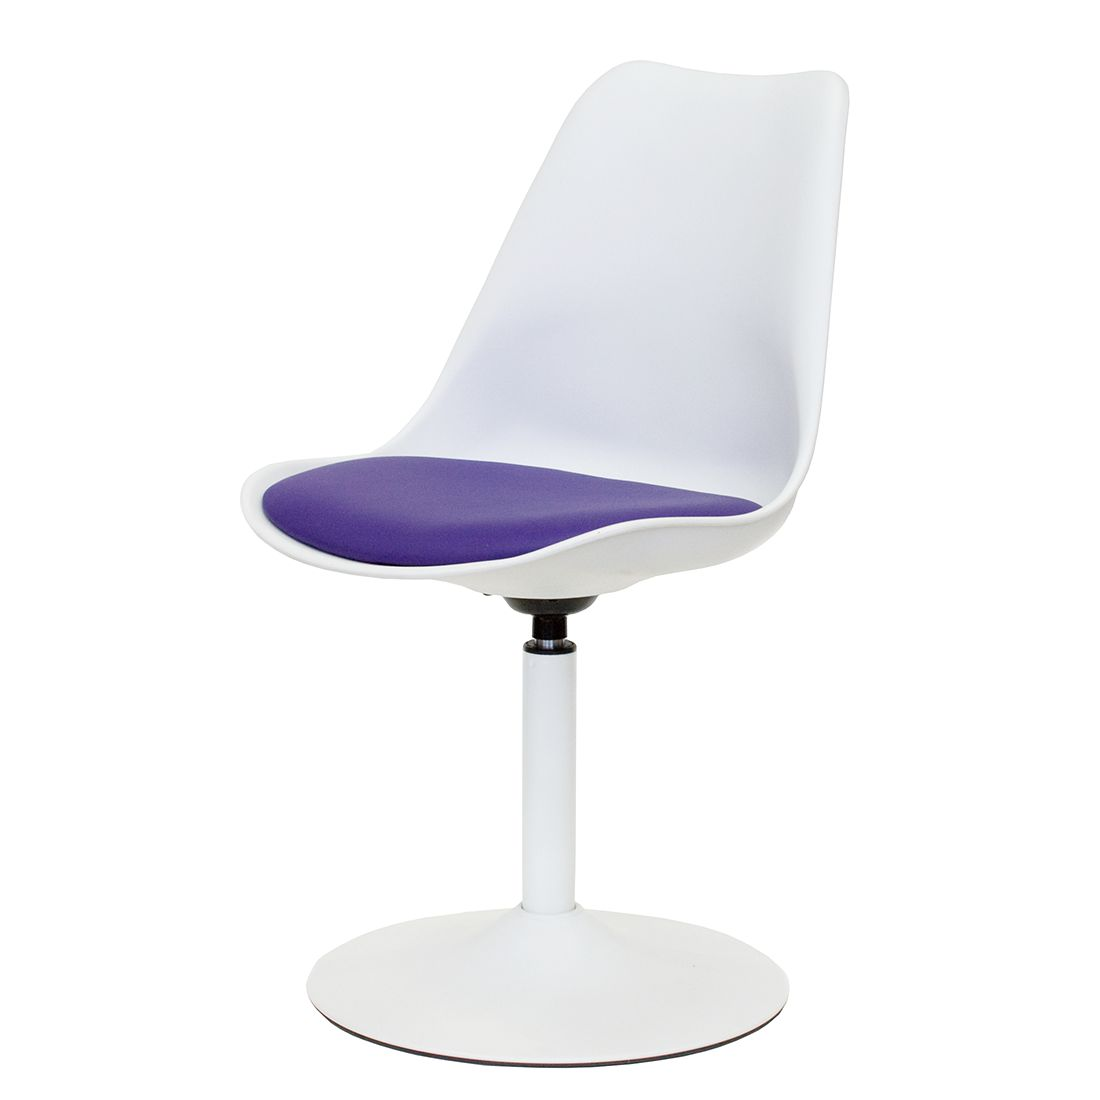 esszimmerstuhl tequila i wei lila tenzo m bel24 online. Black Bedroom Furniture Sets. Home Design Ideas